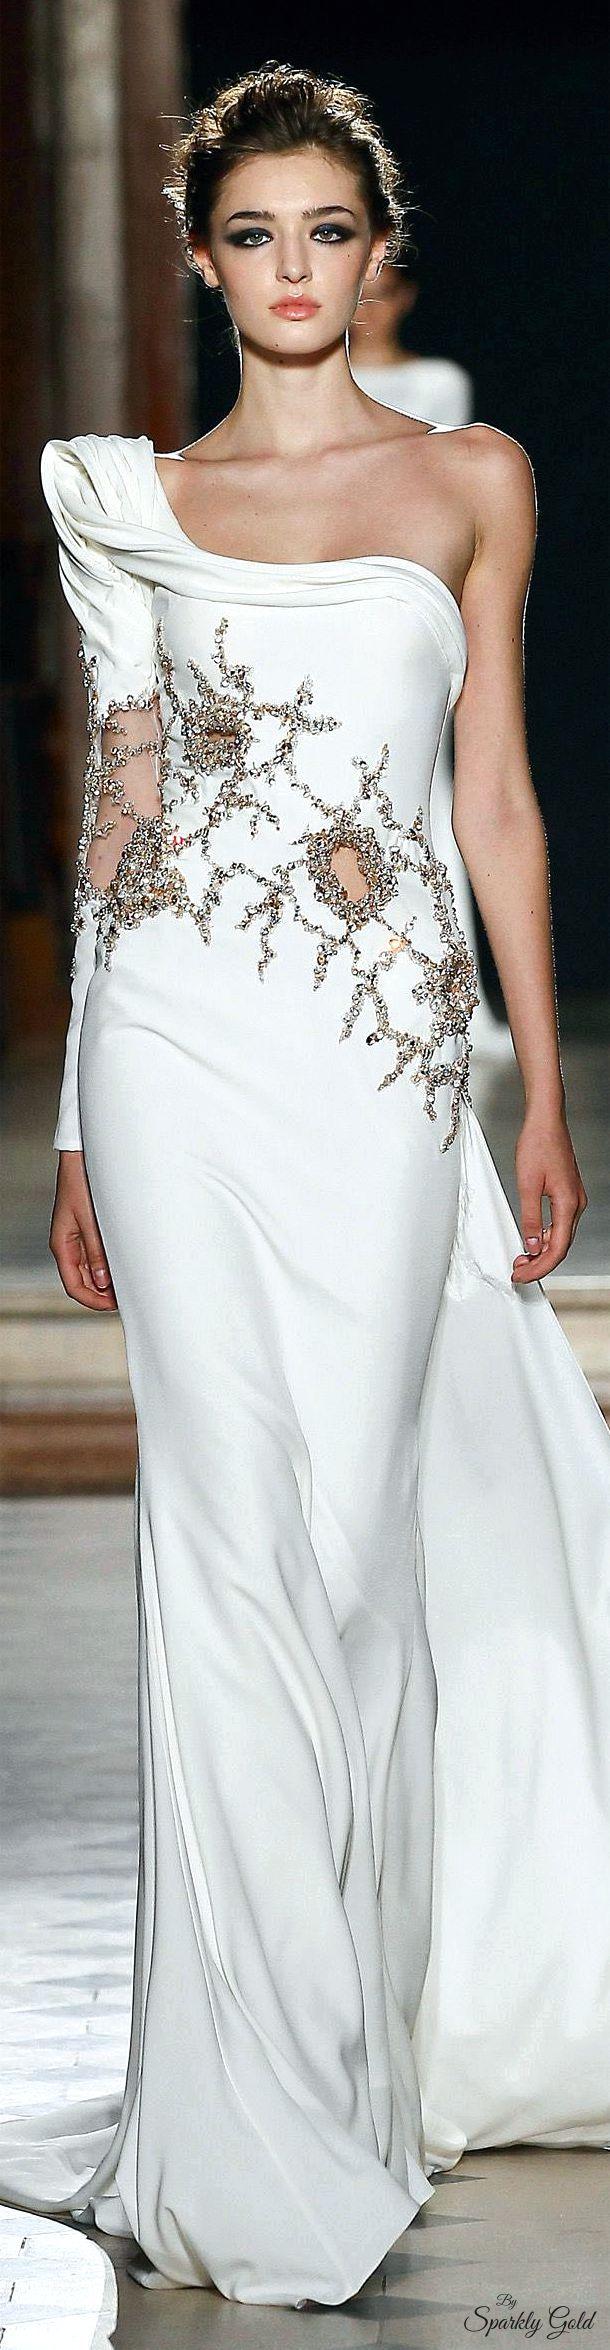 17 Best ideas about White Gowns on Pinterest   Elegant dresses ...